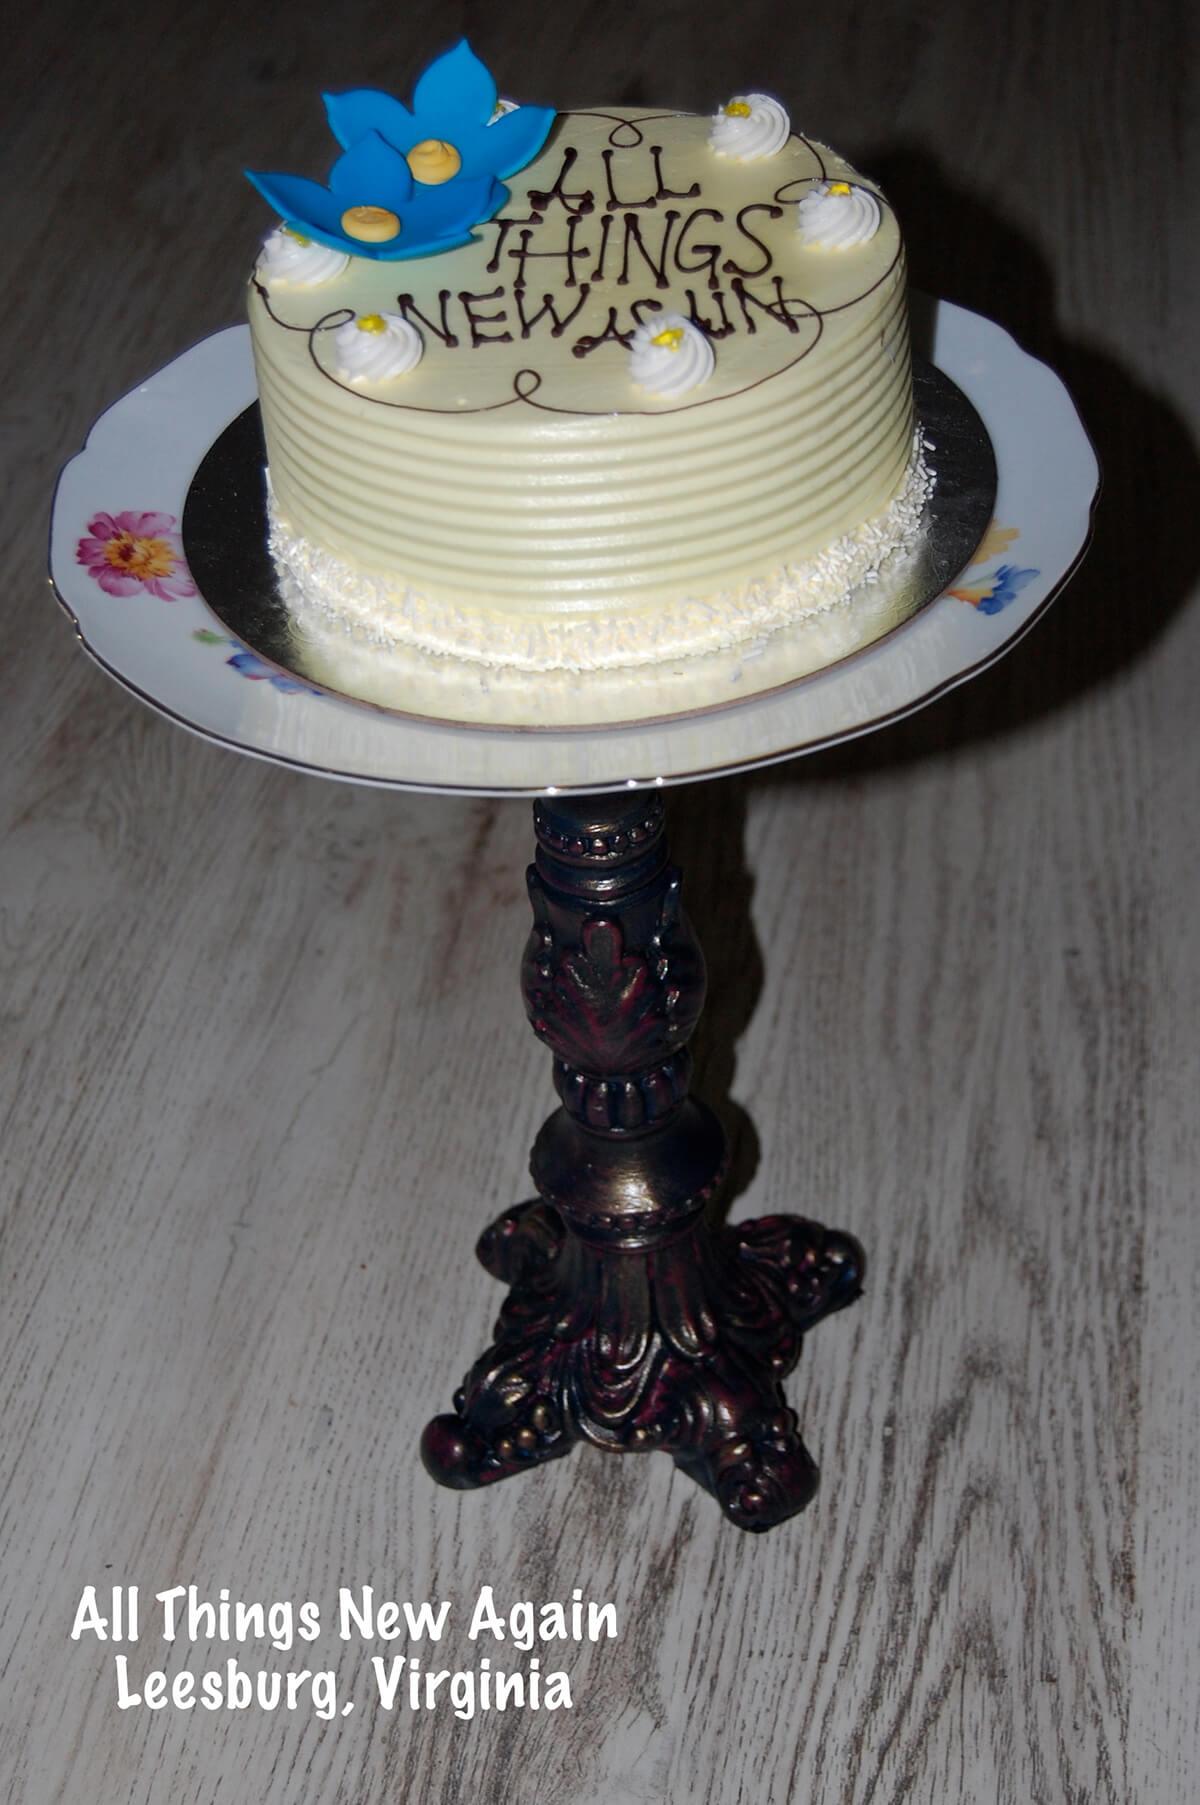 DIY Broken Upcycling Lamps Cake Plate Idea